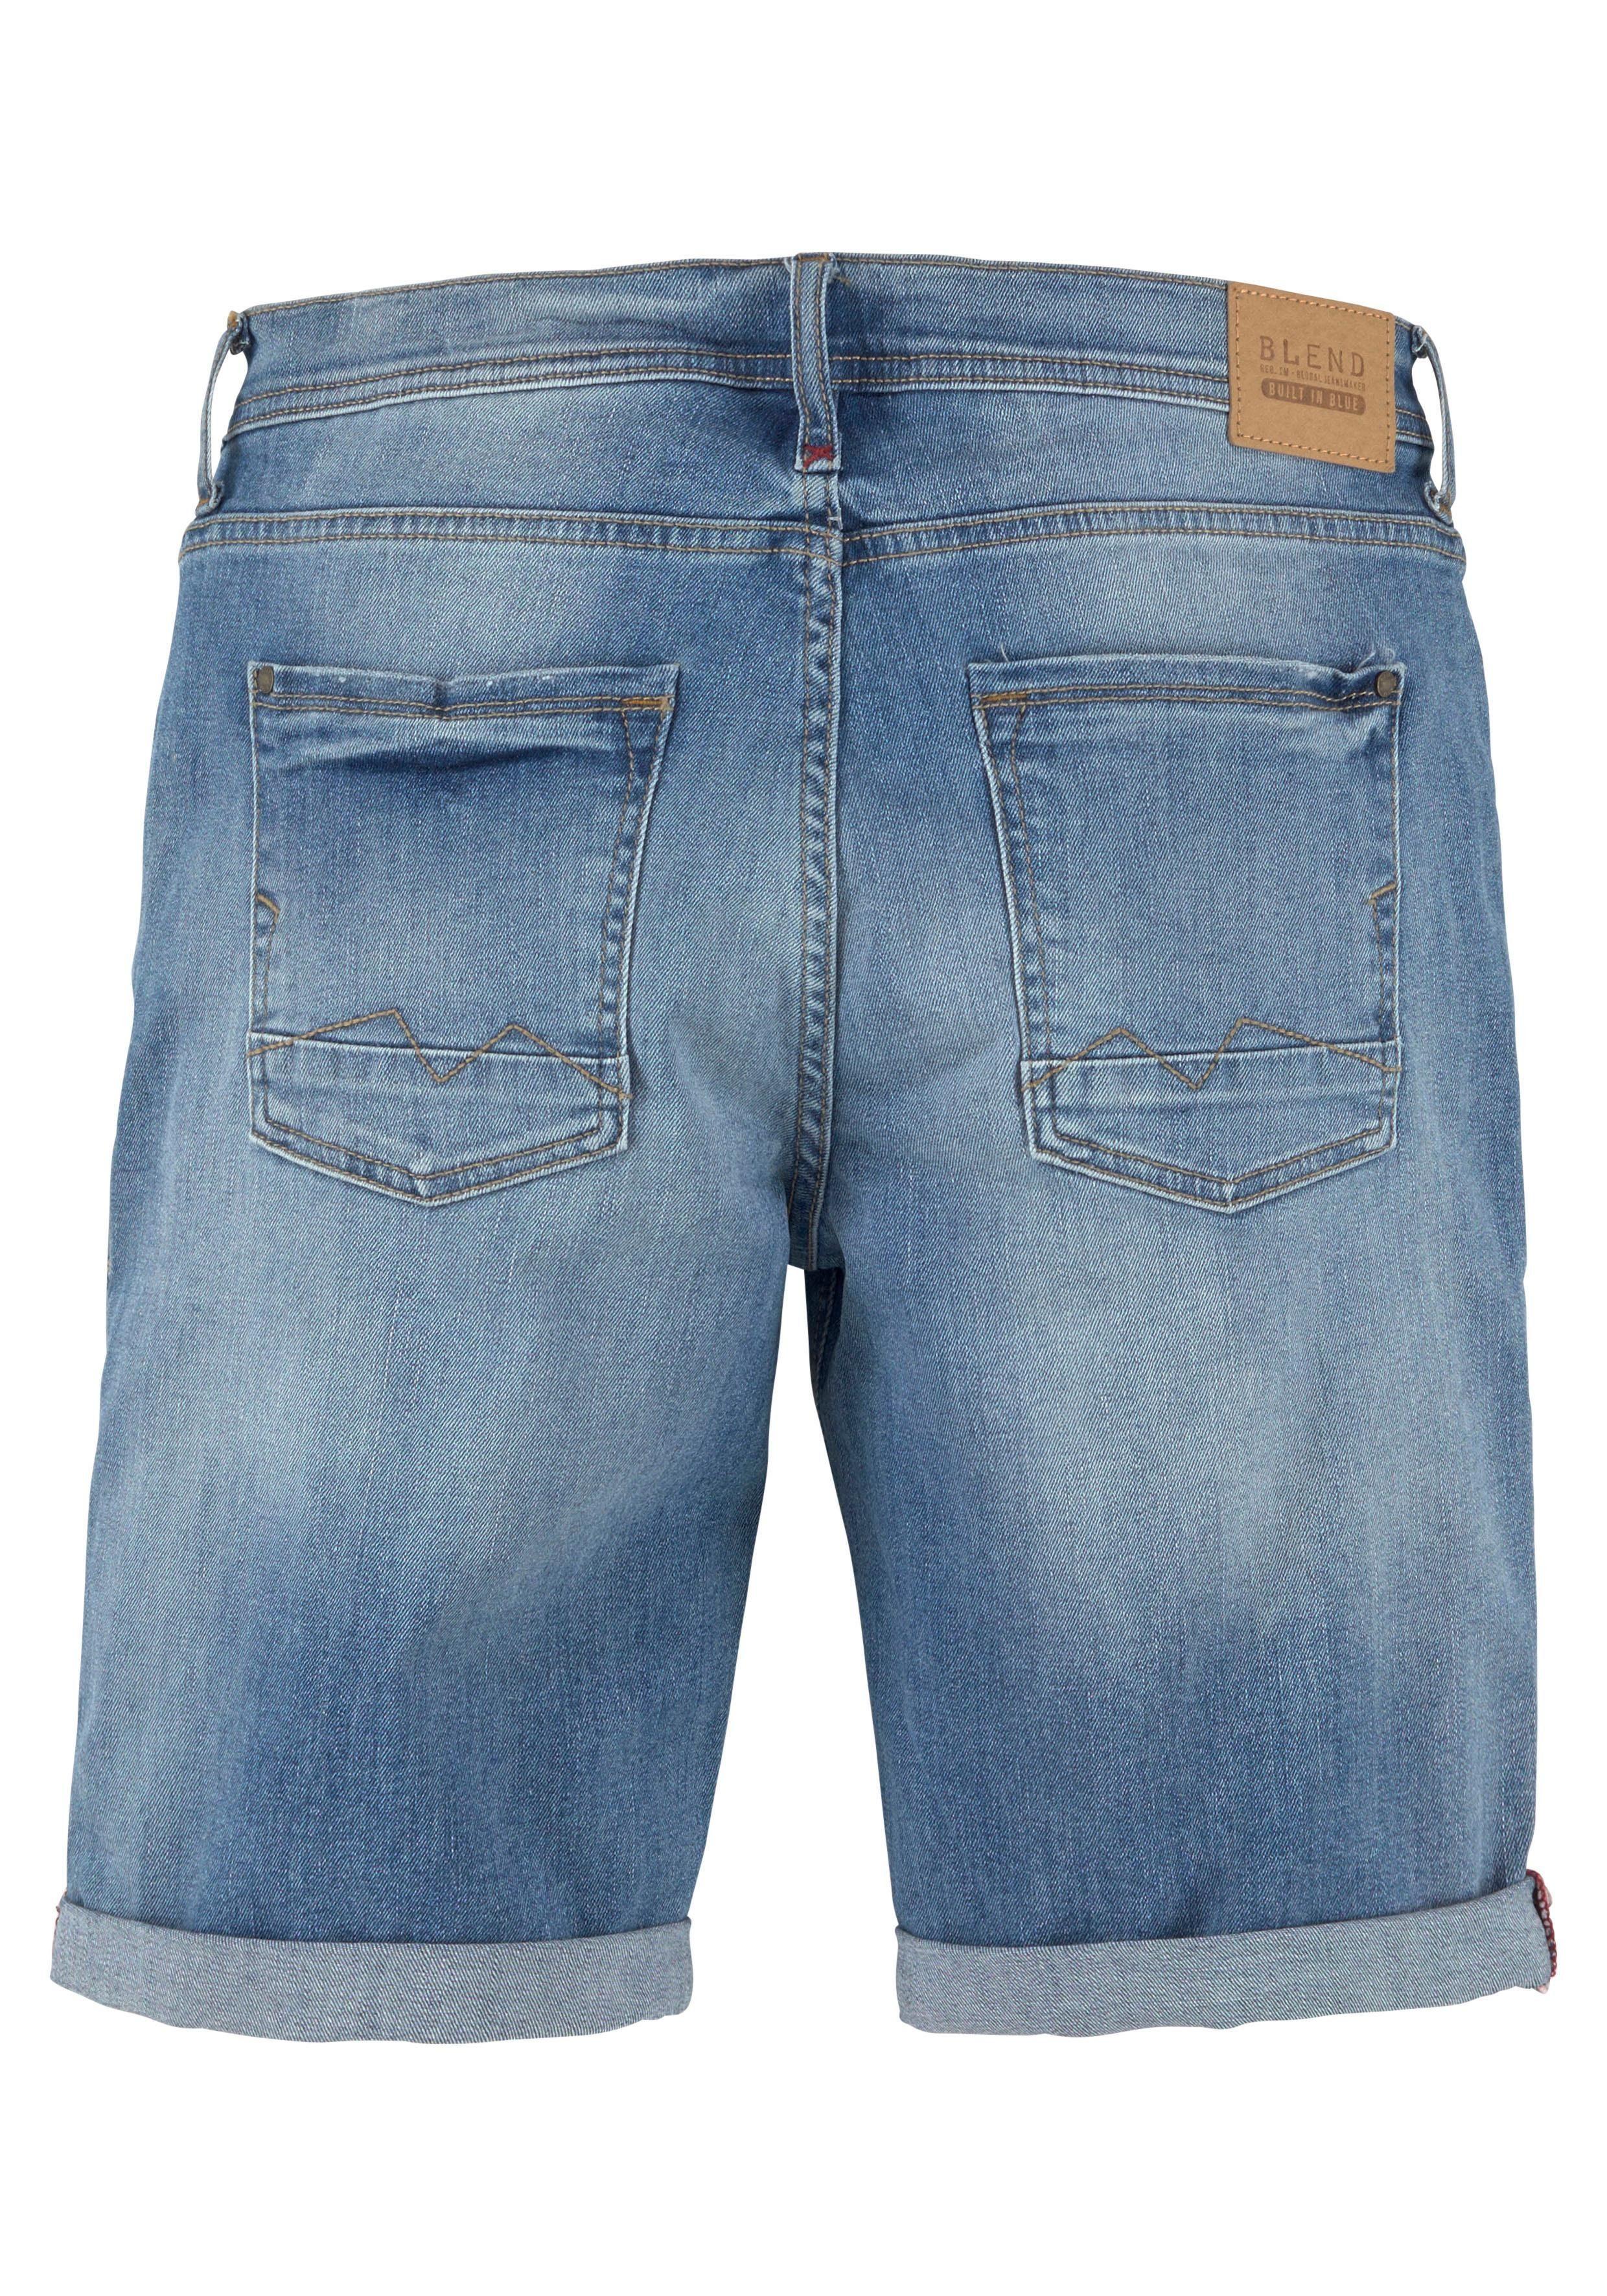 »twister« Kaufen Online Blend Blend Jeansbermudas lFKc3T1J